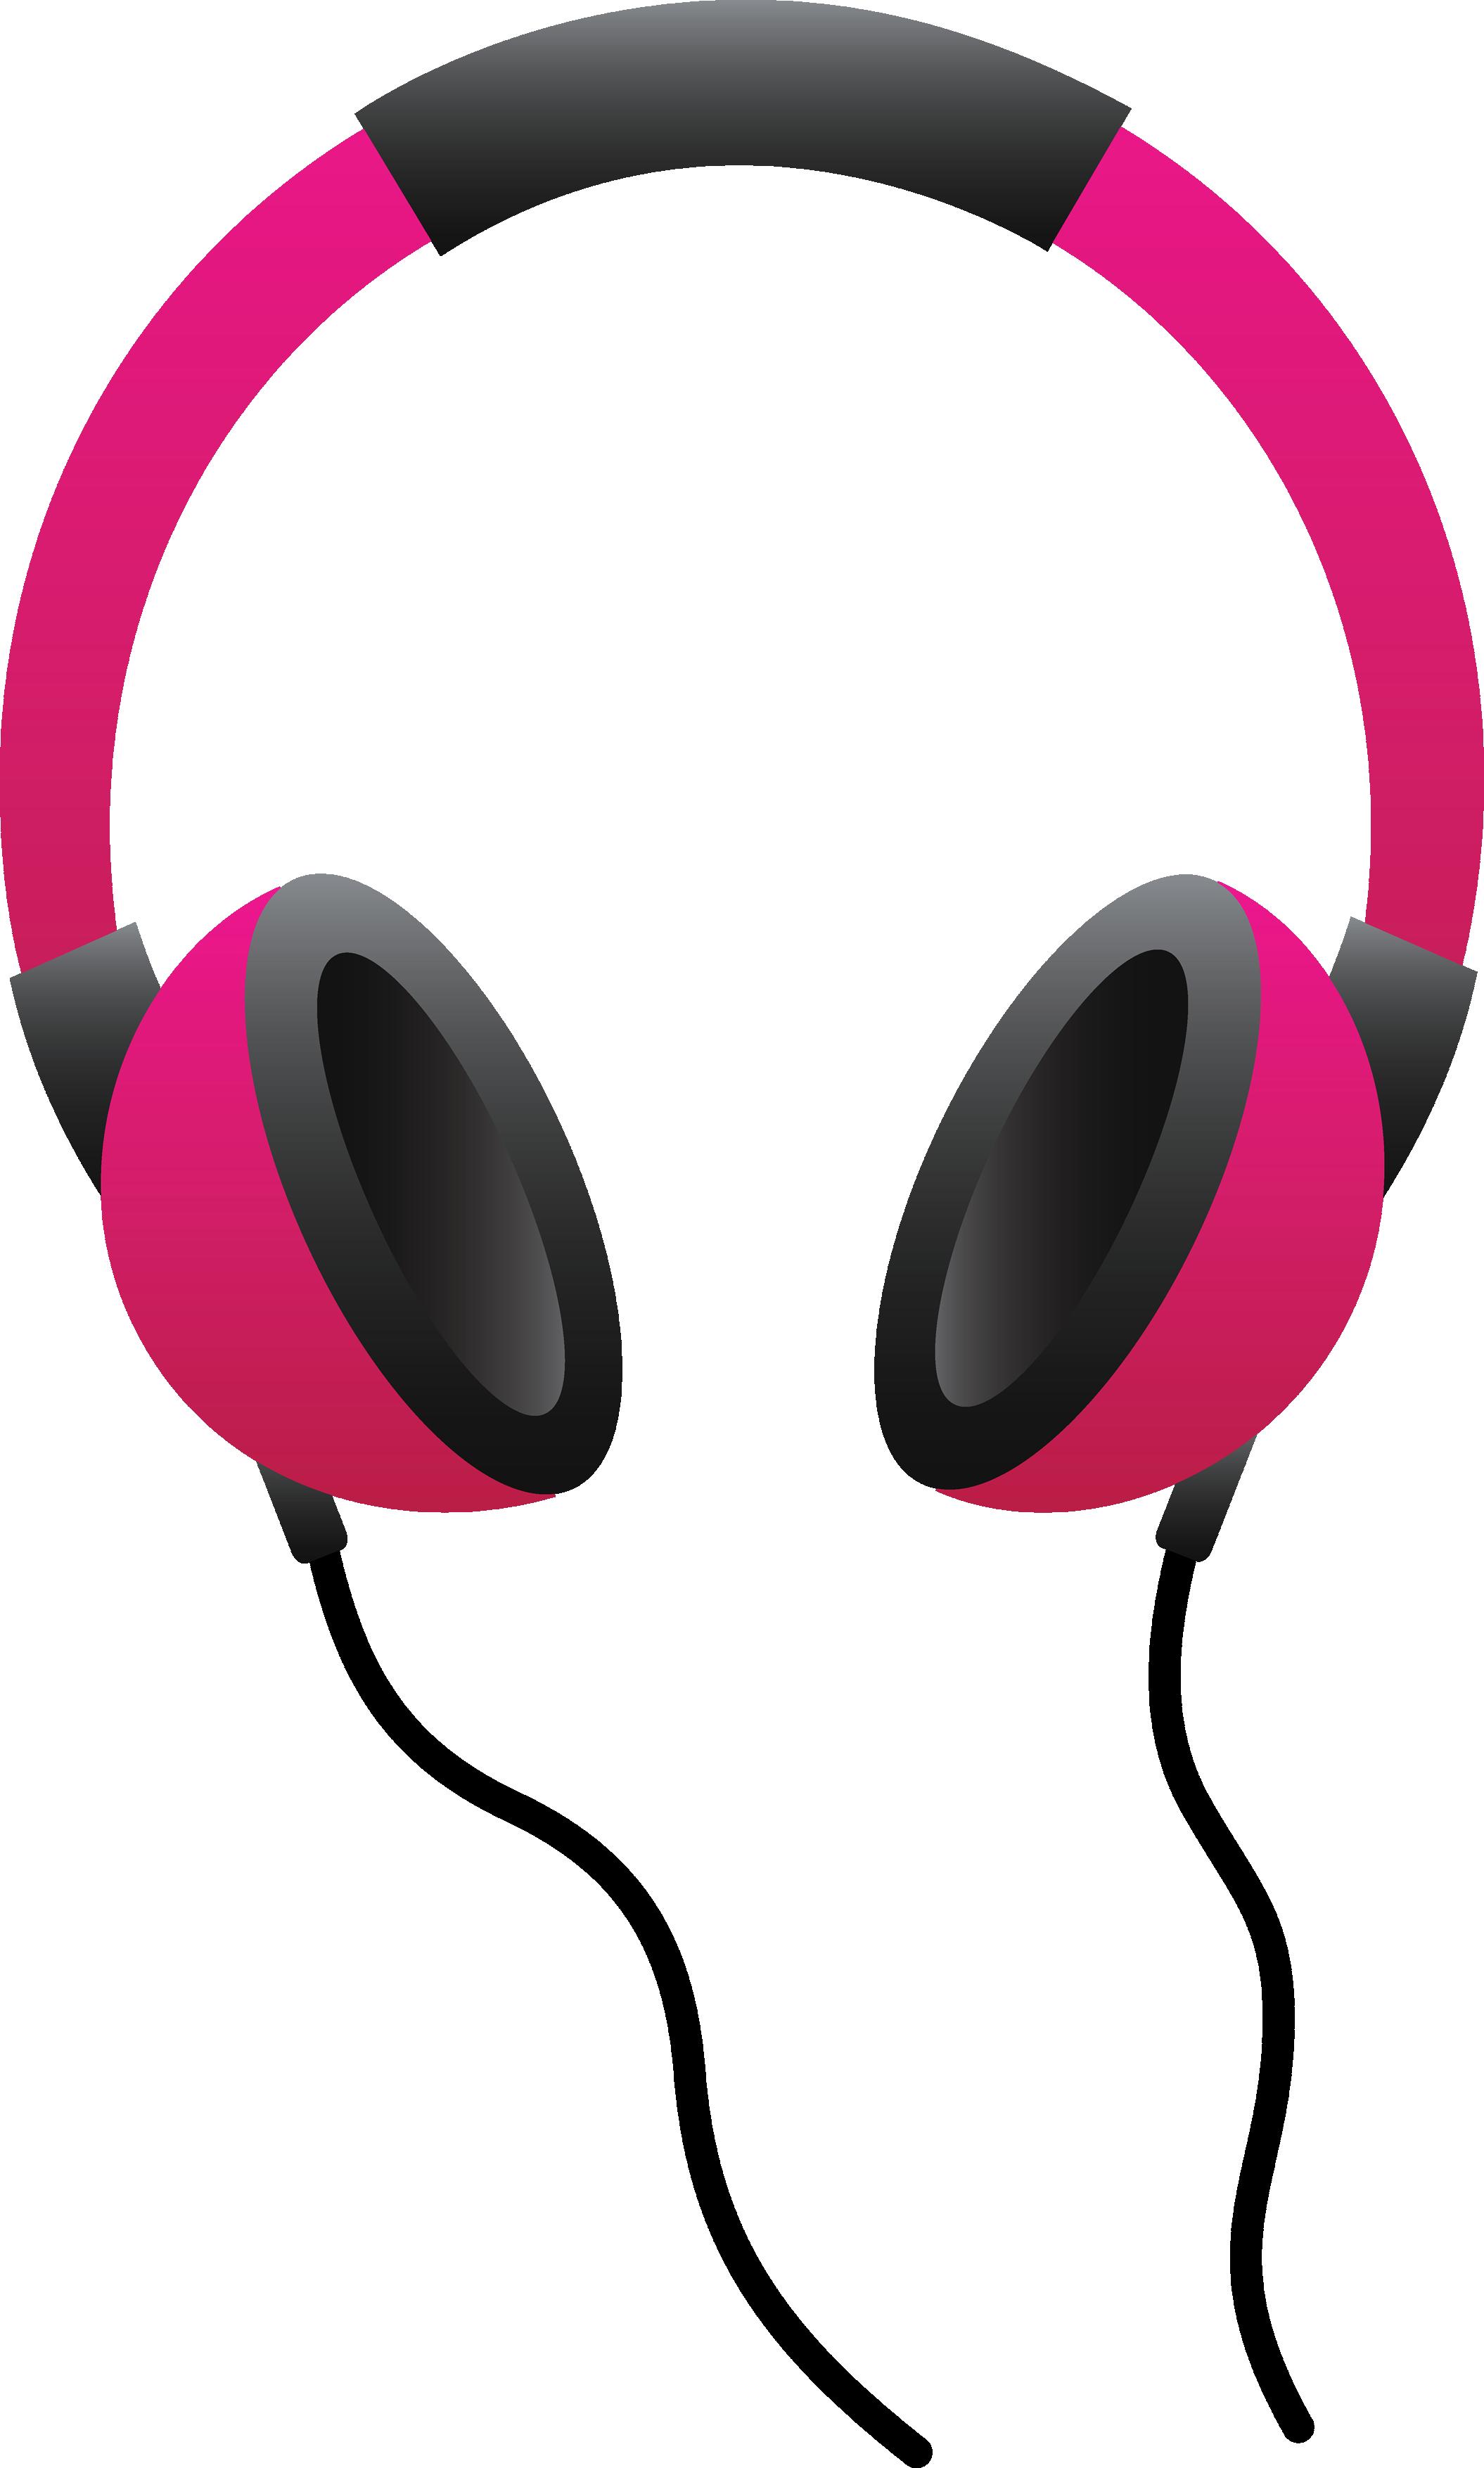 Png images free download. Headphones clipart transparent background